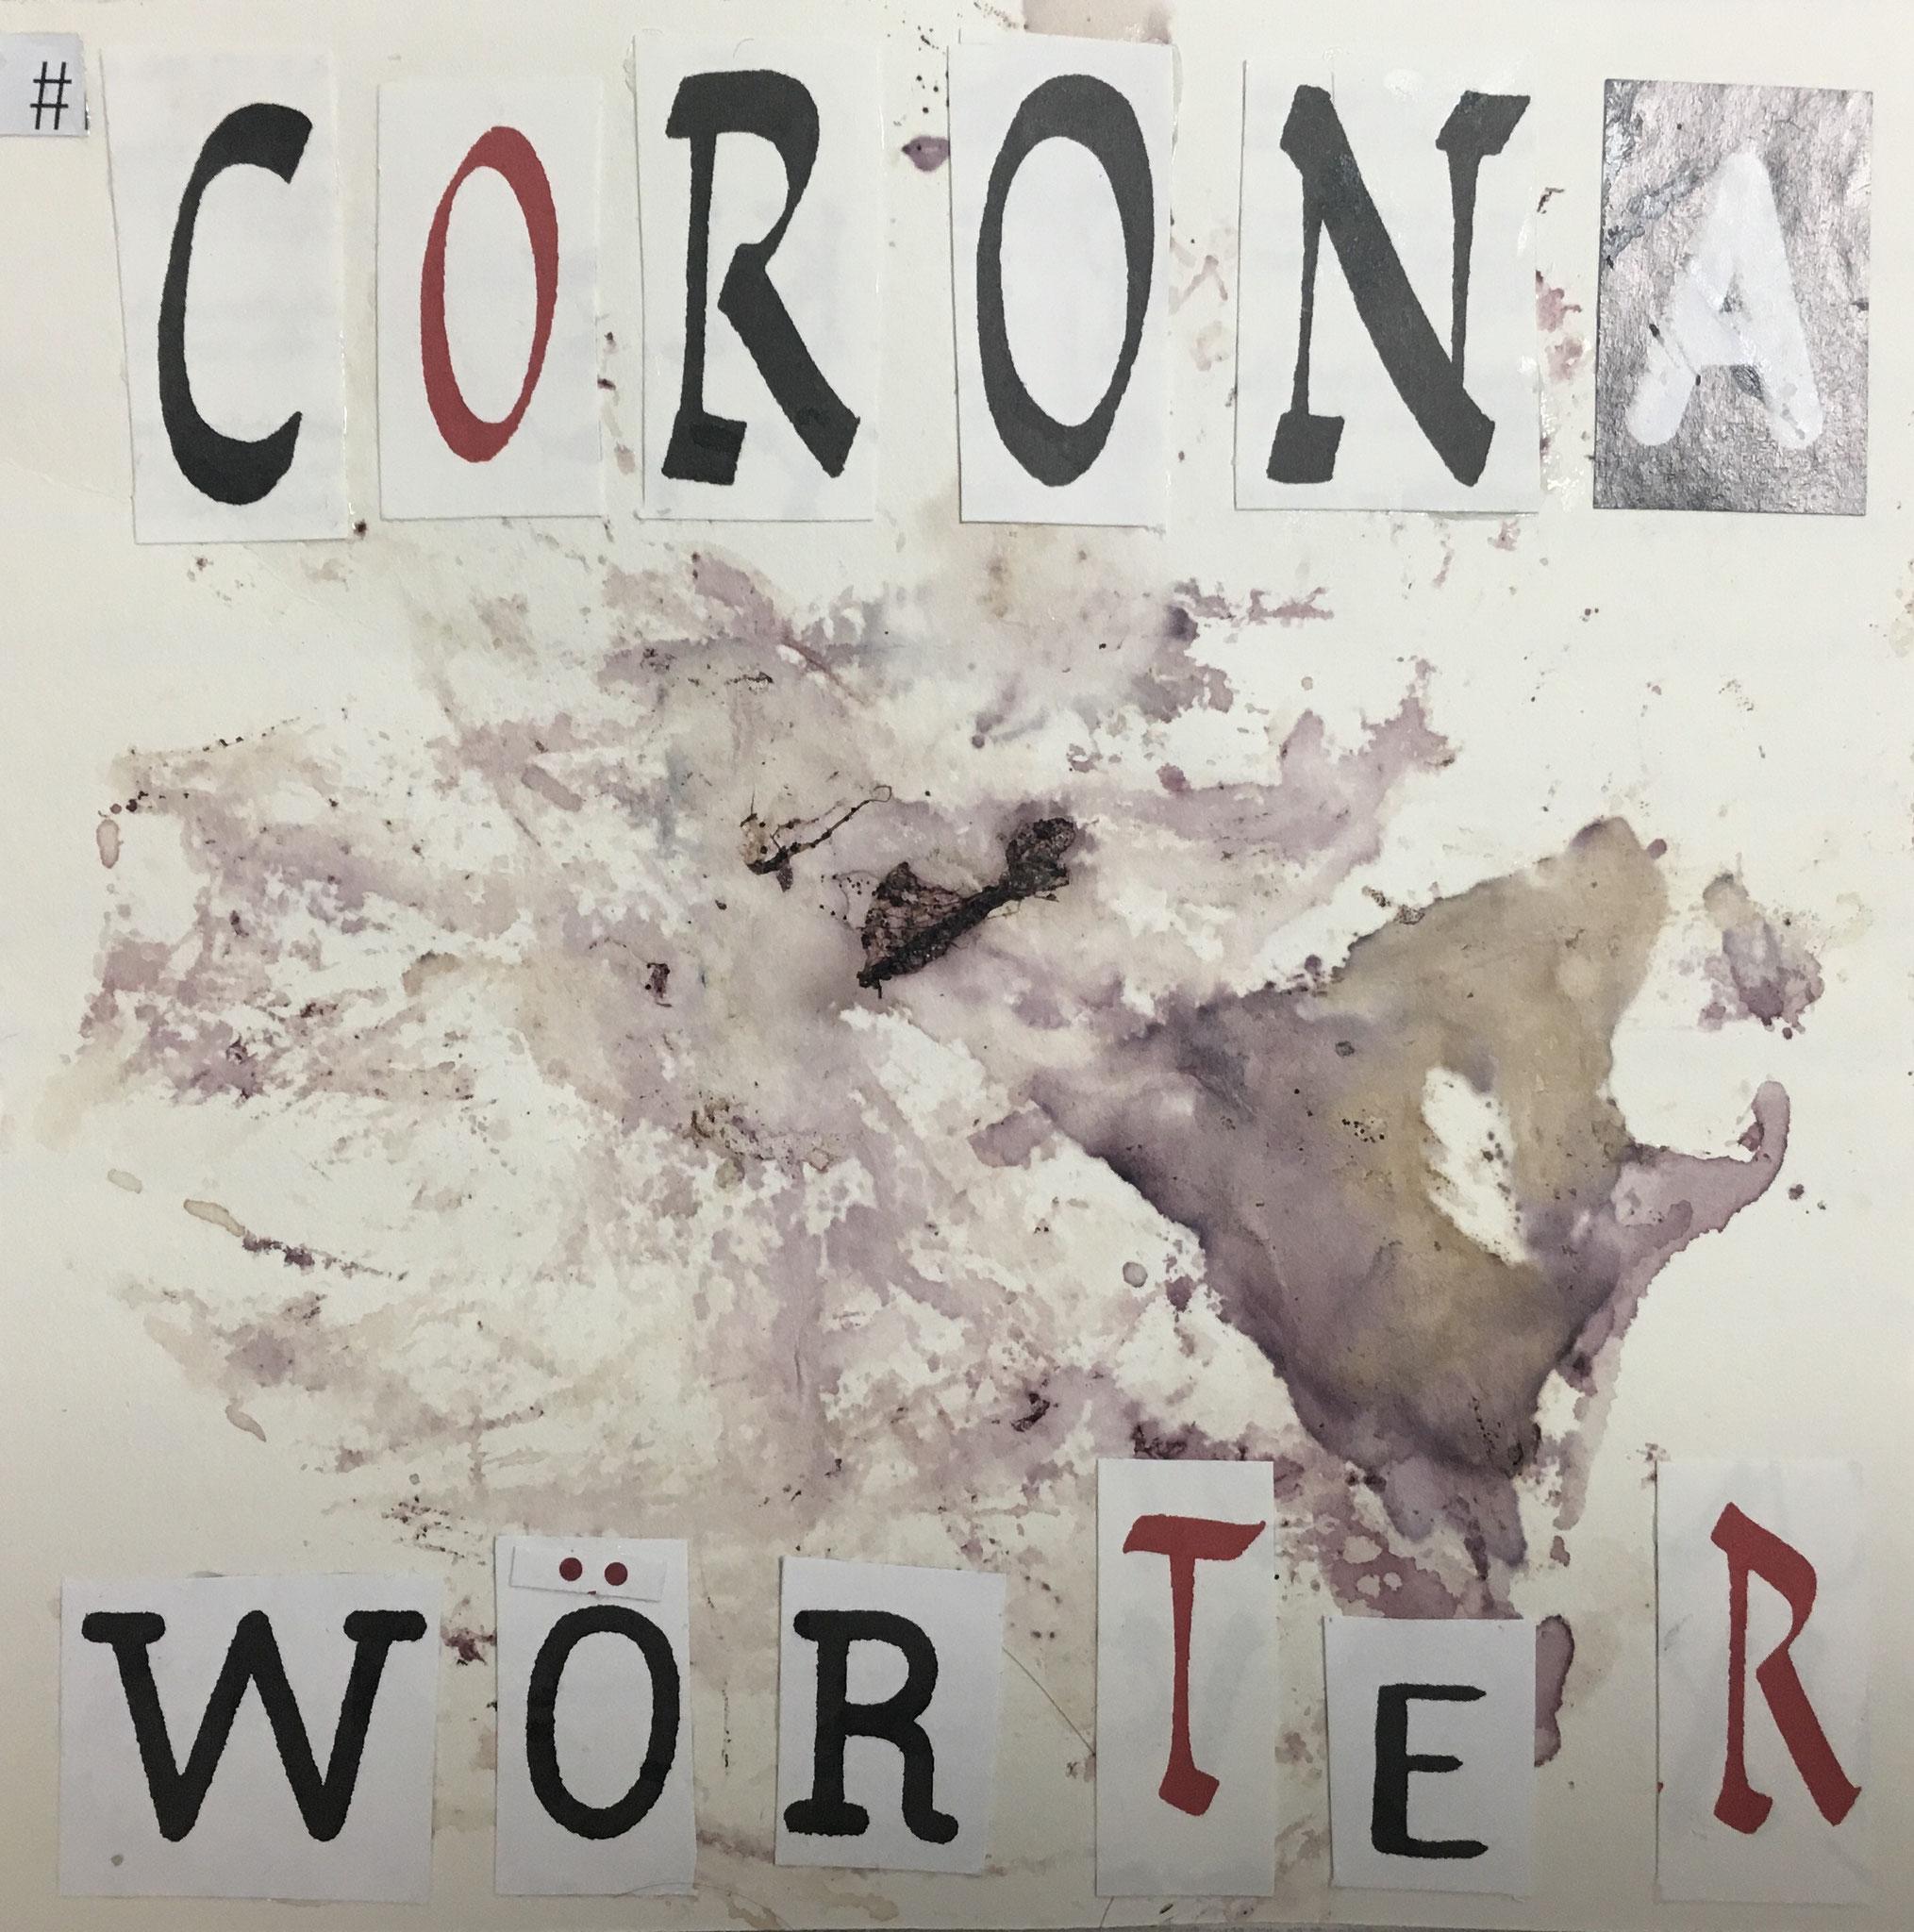 Corona Wörter ohne ende.